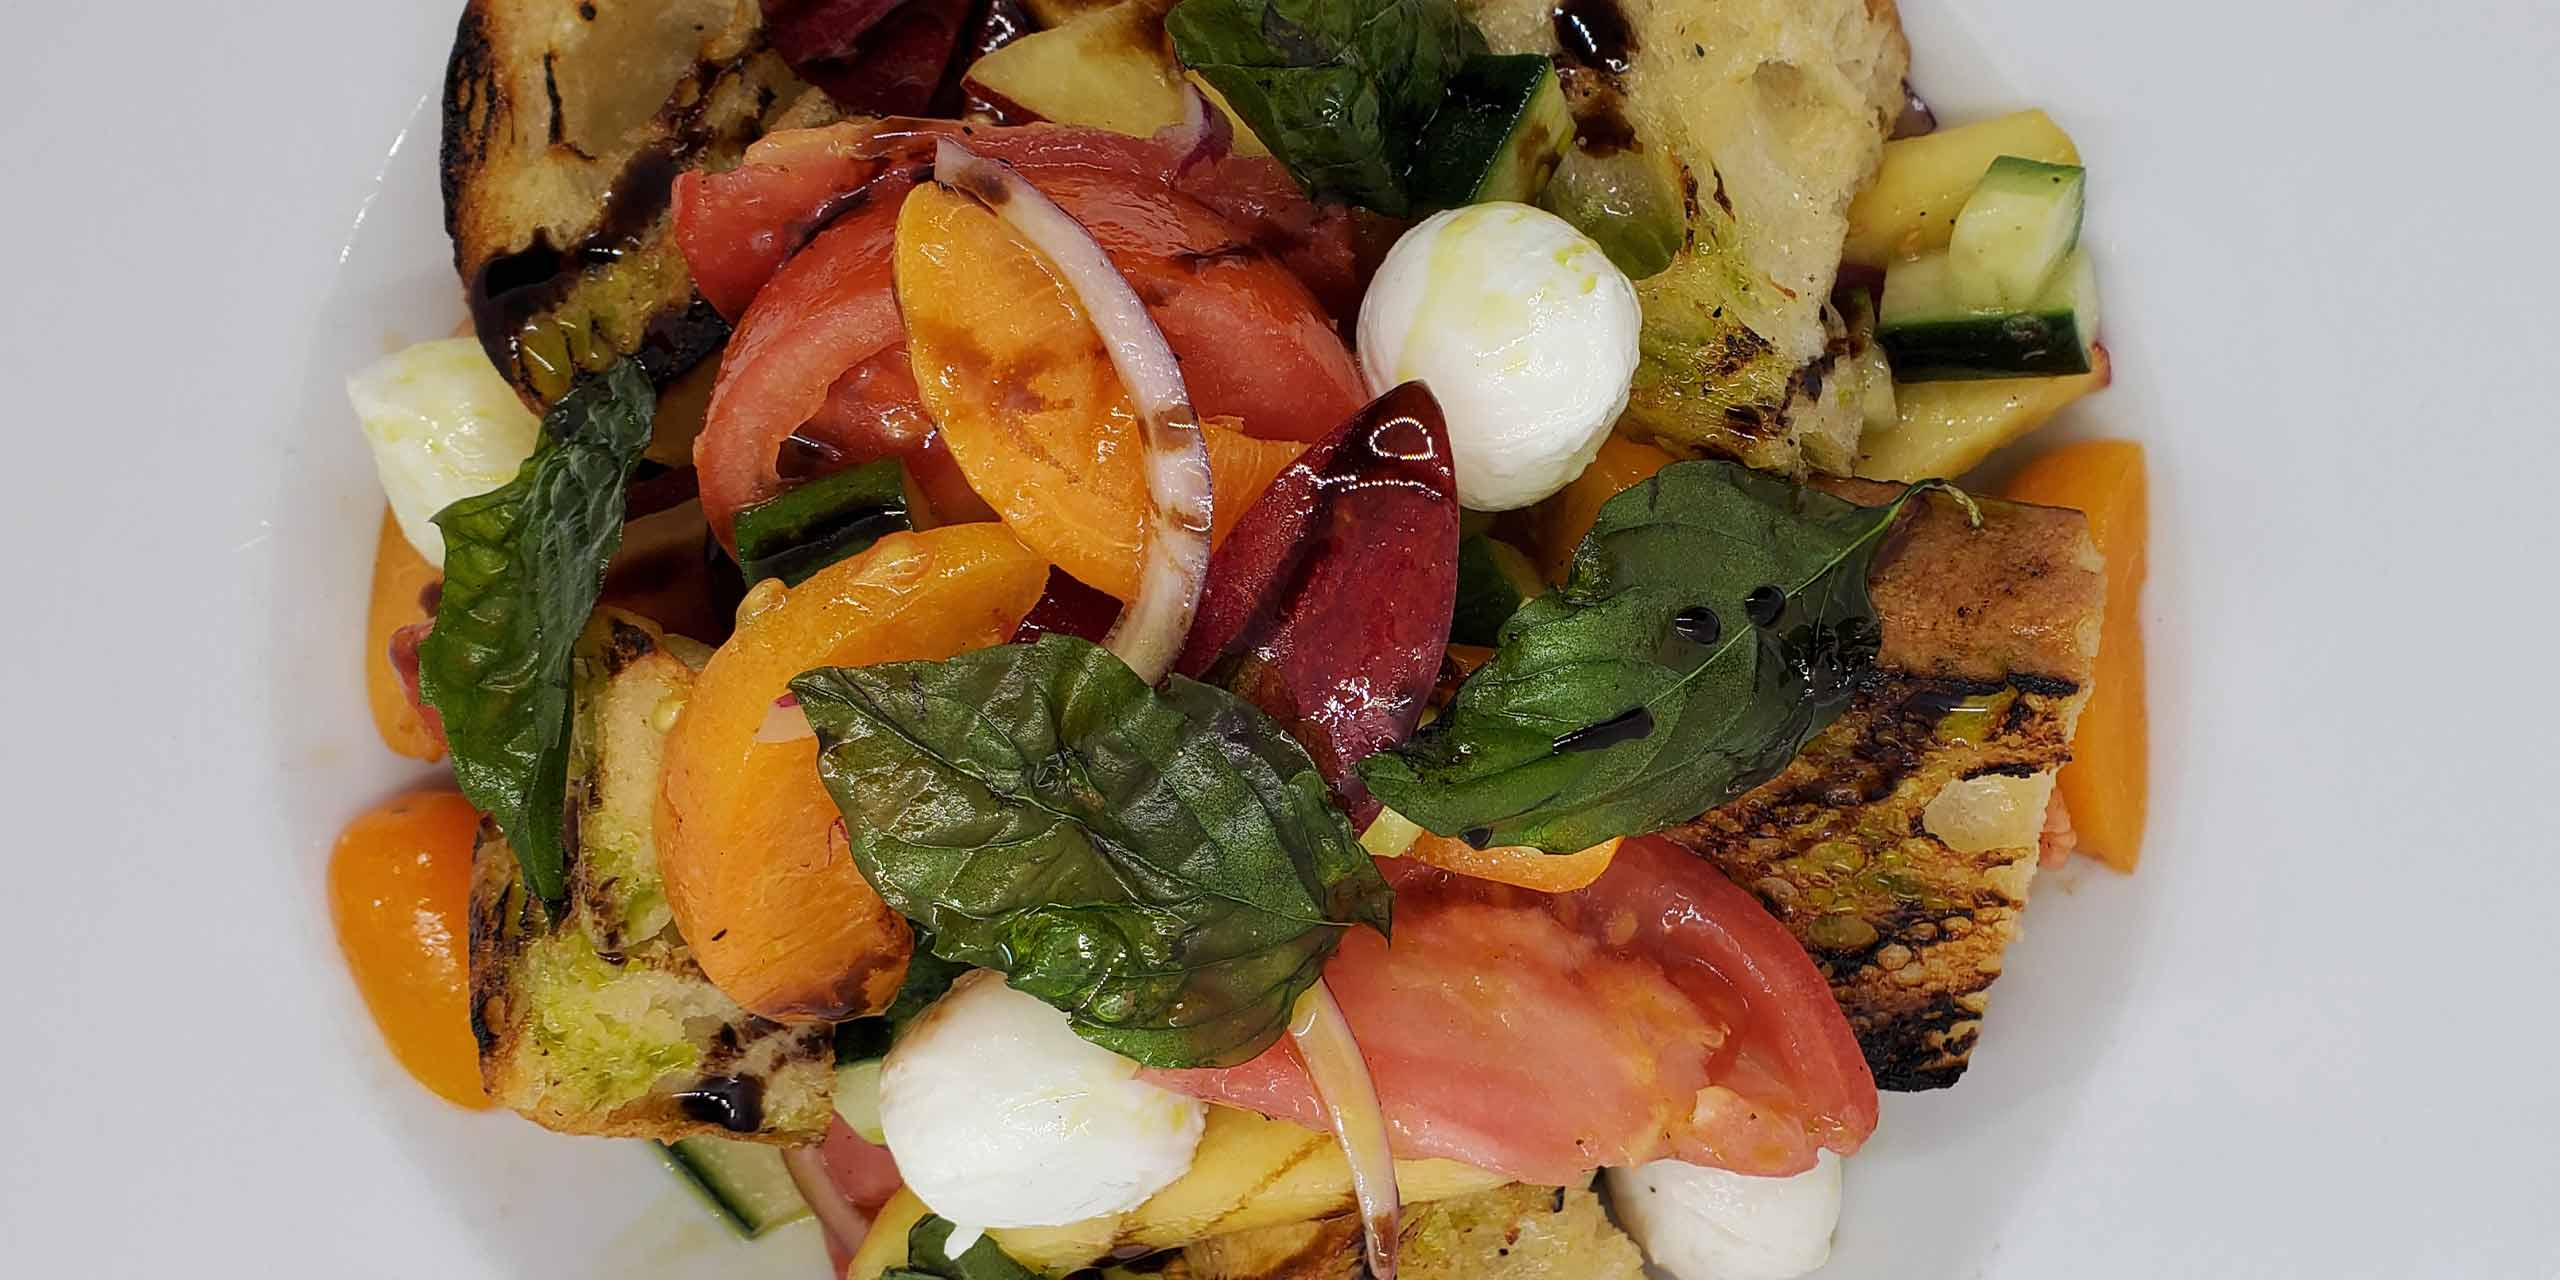 Painzanella salad with mozzarella balls